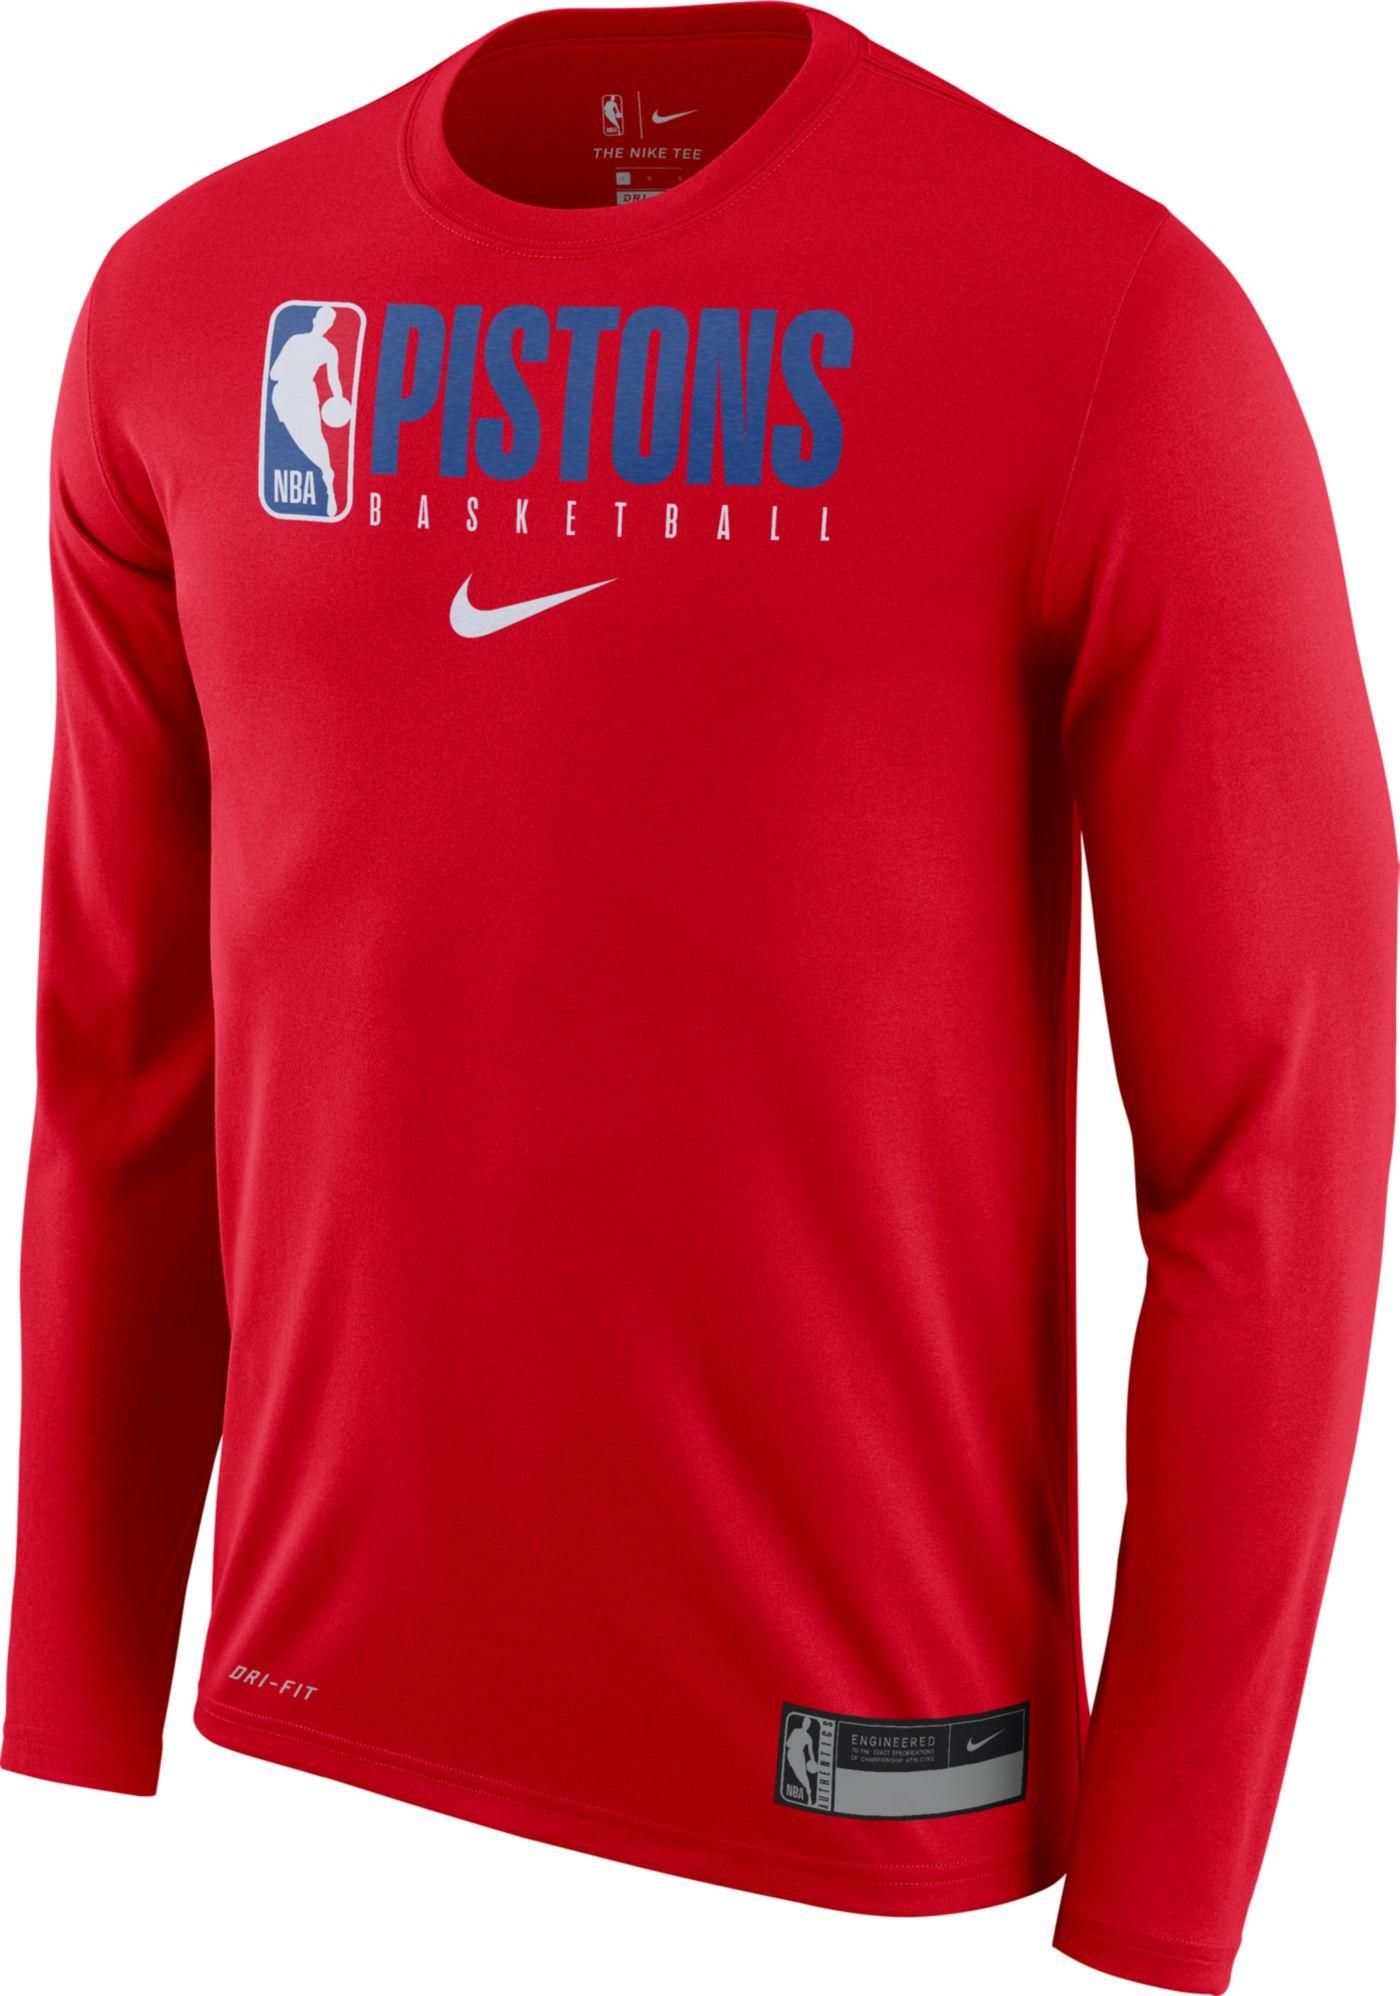 Nike Men's Detroit Pistons Dri-FIT Practice Long Sleeve Shirt